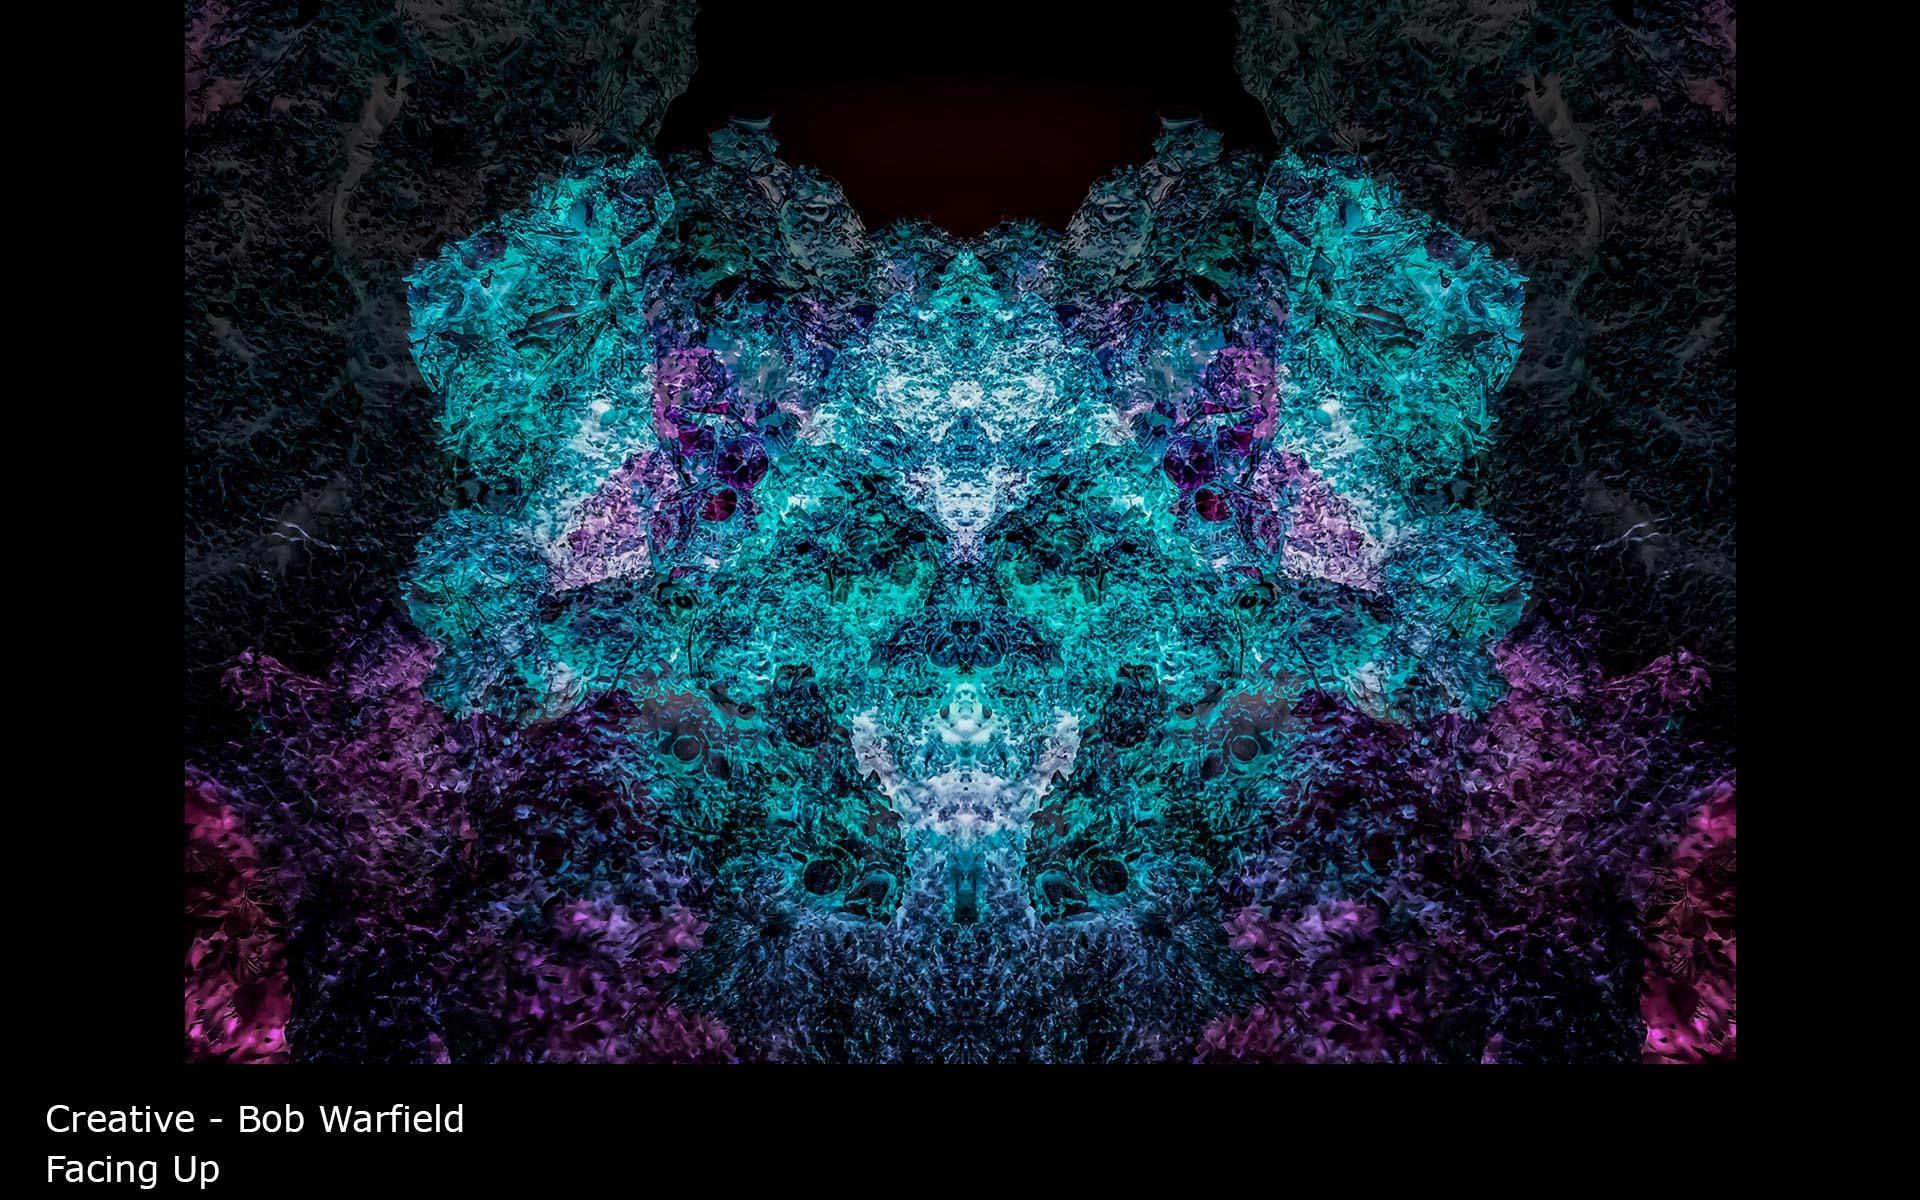 Facing Up - Bob Warfield